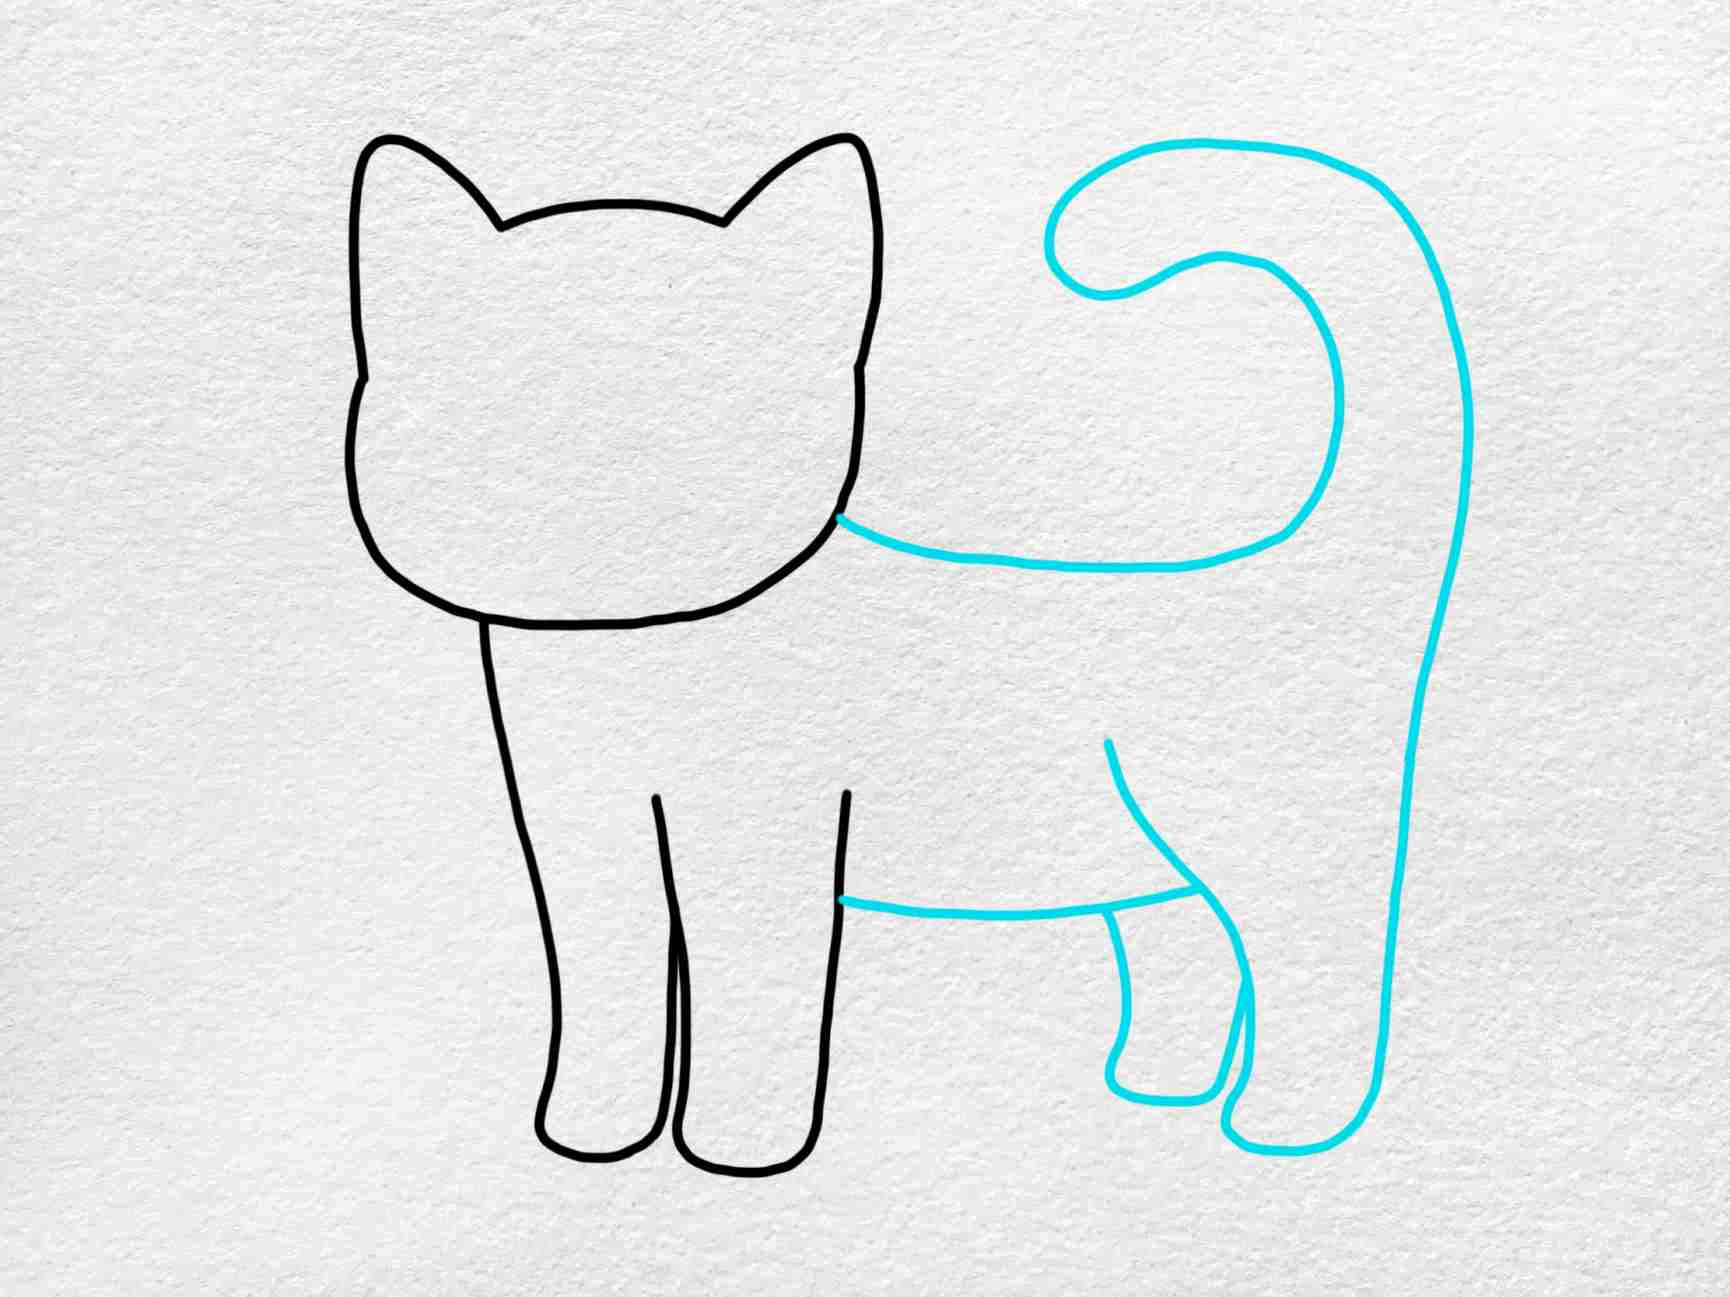 Cute Kitty Drawing: Step 3